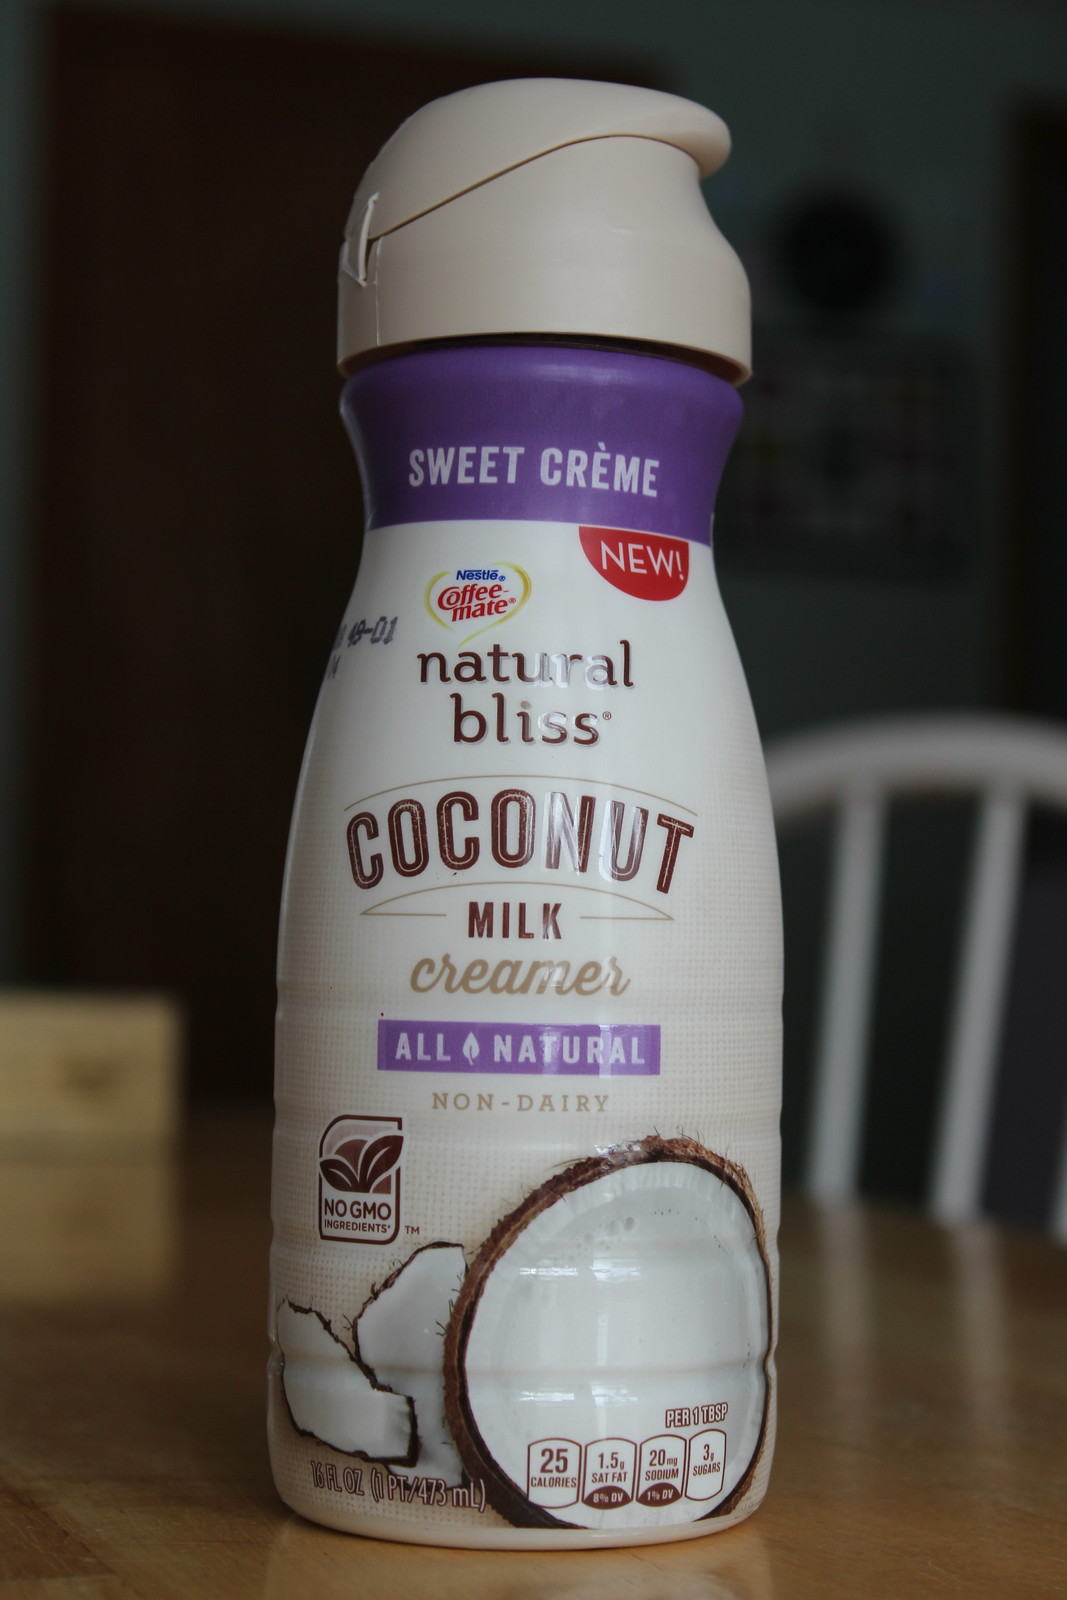 CoffeeMate Vegan Creamer Coconut